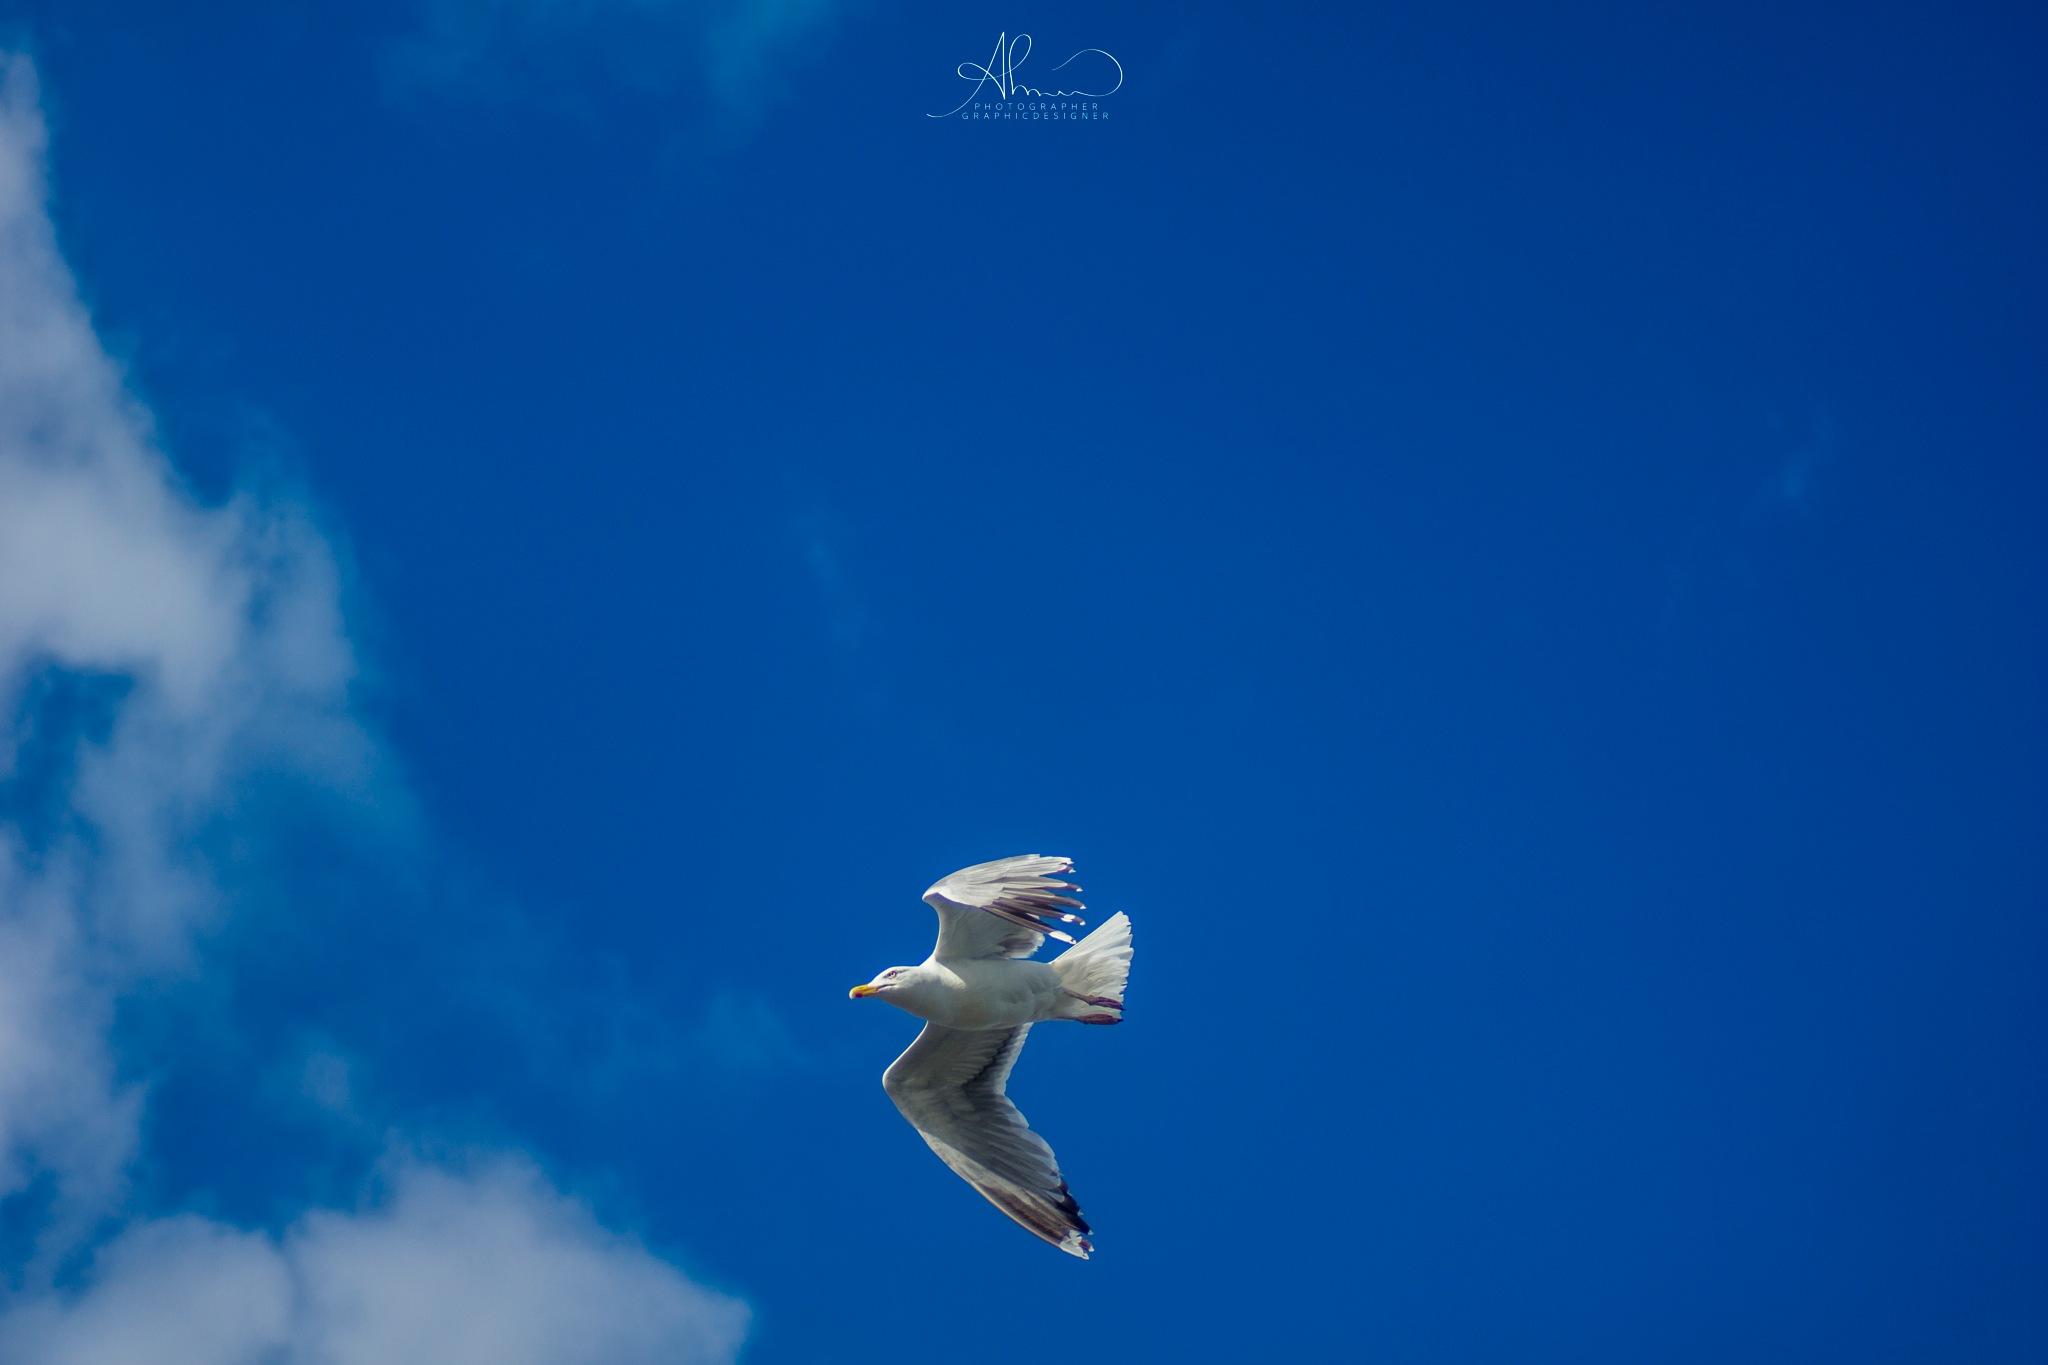 Fly  by AhmadAlsaad